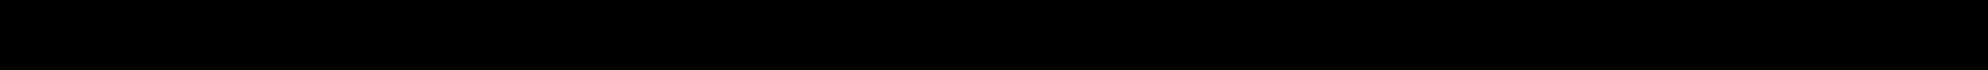 Image-Shr-leo-3